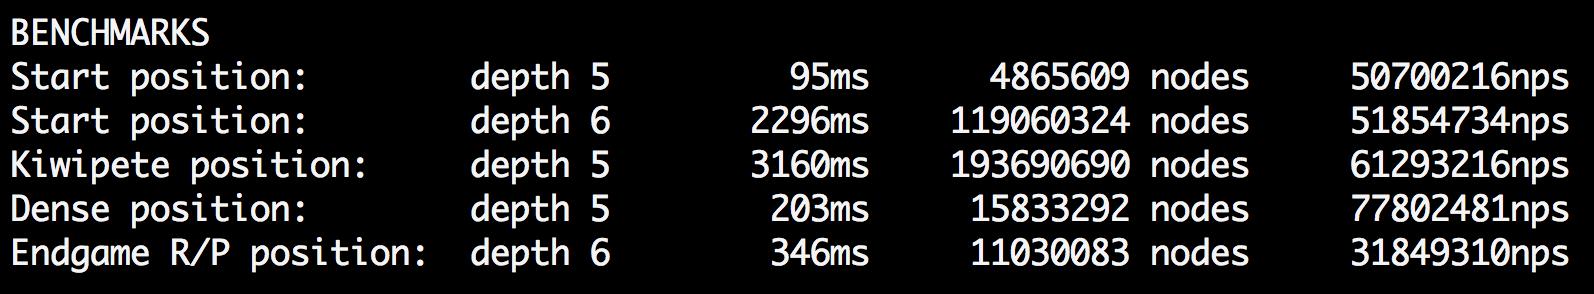 Sample Benchmark Results